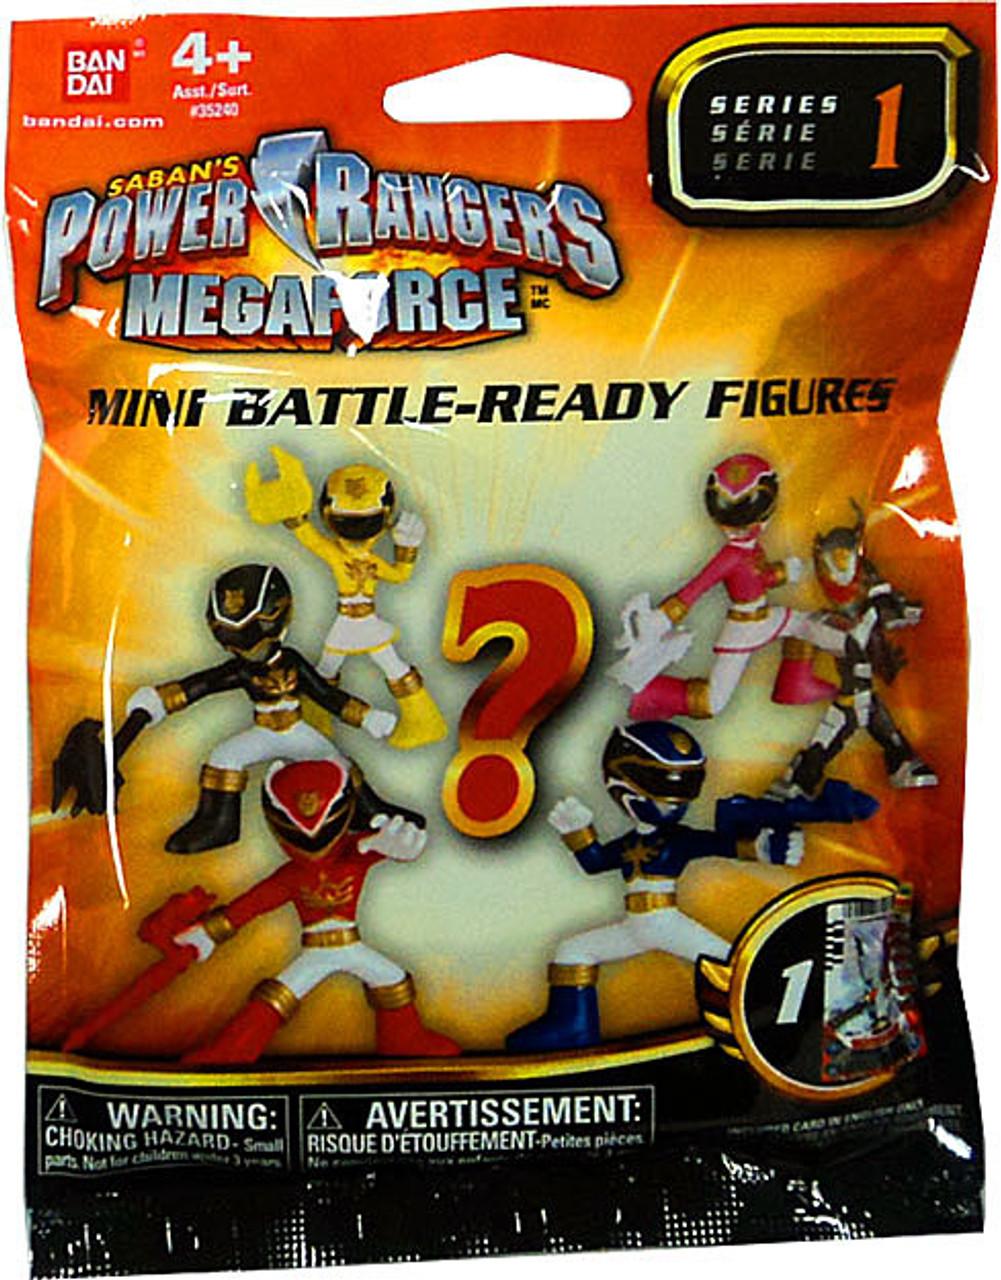 Power Rangers Megaforce Series 1 Mini Battle-Ready Figures Mystery Pack